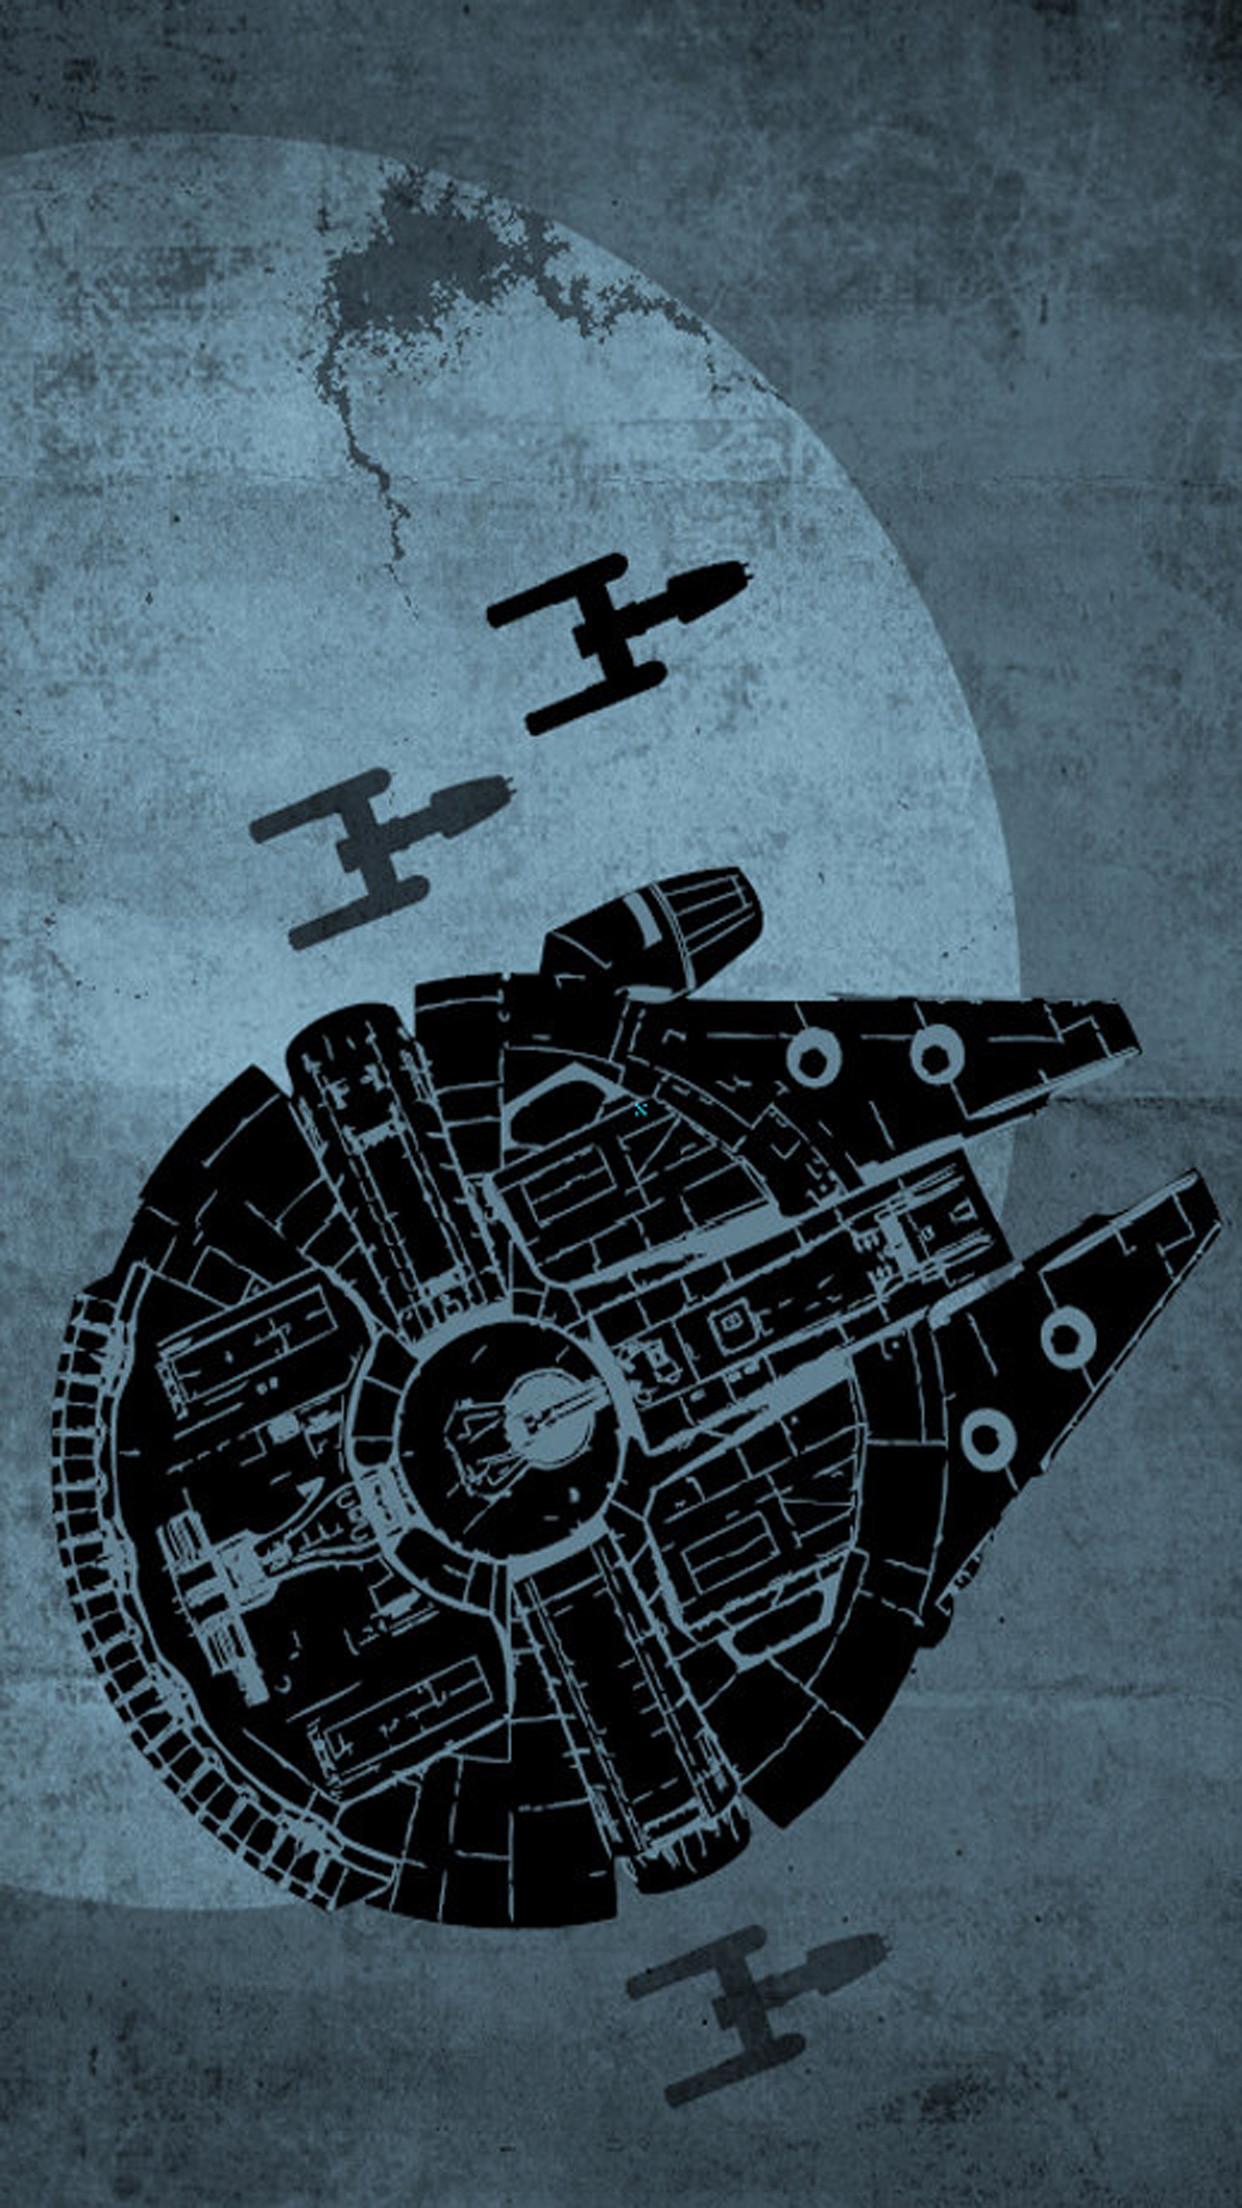 clone trooper iphone wallpaper (65+ images)